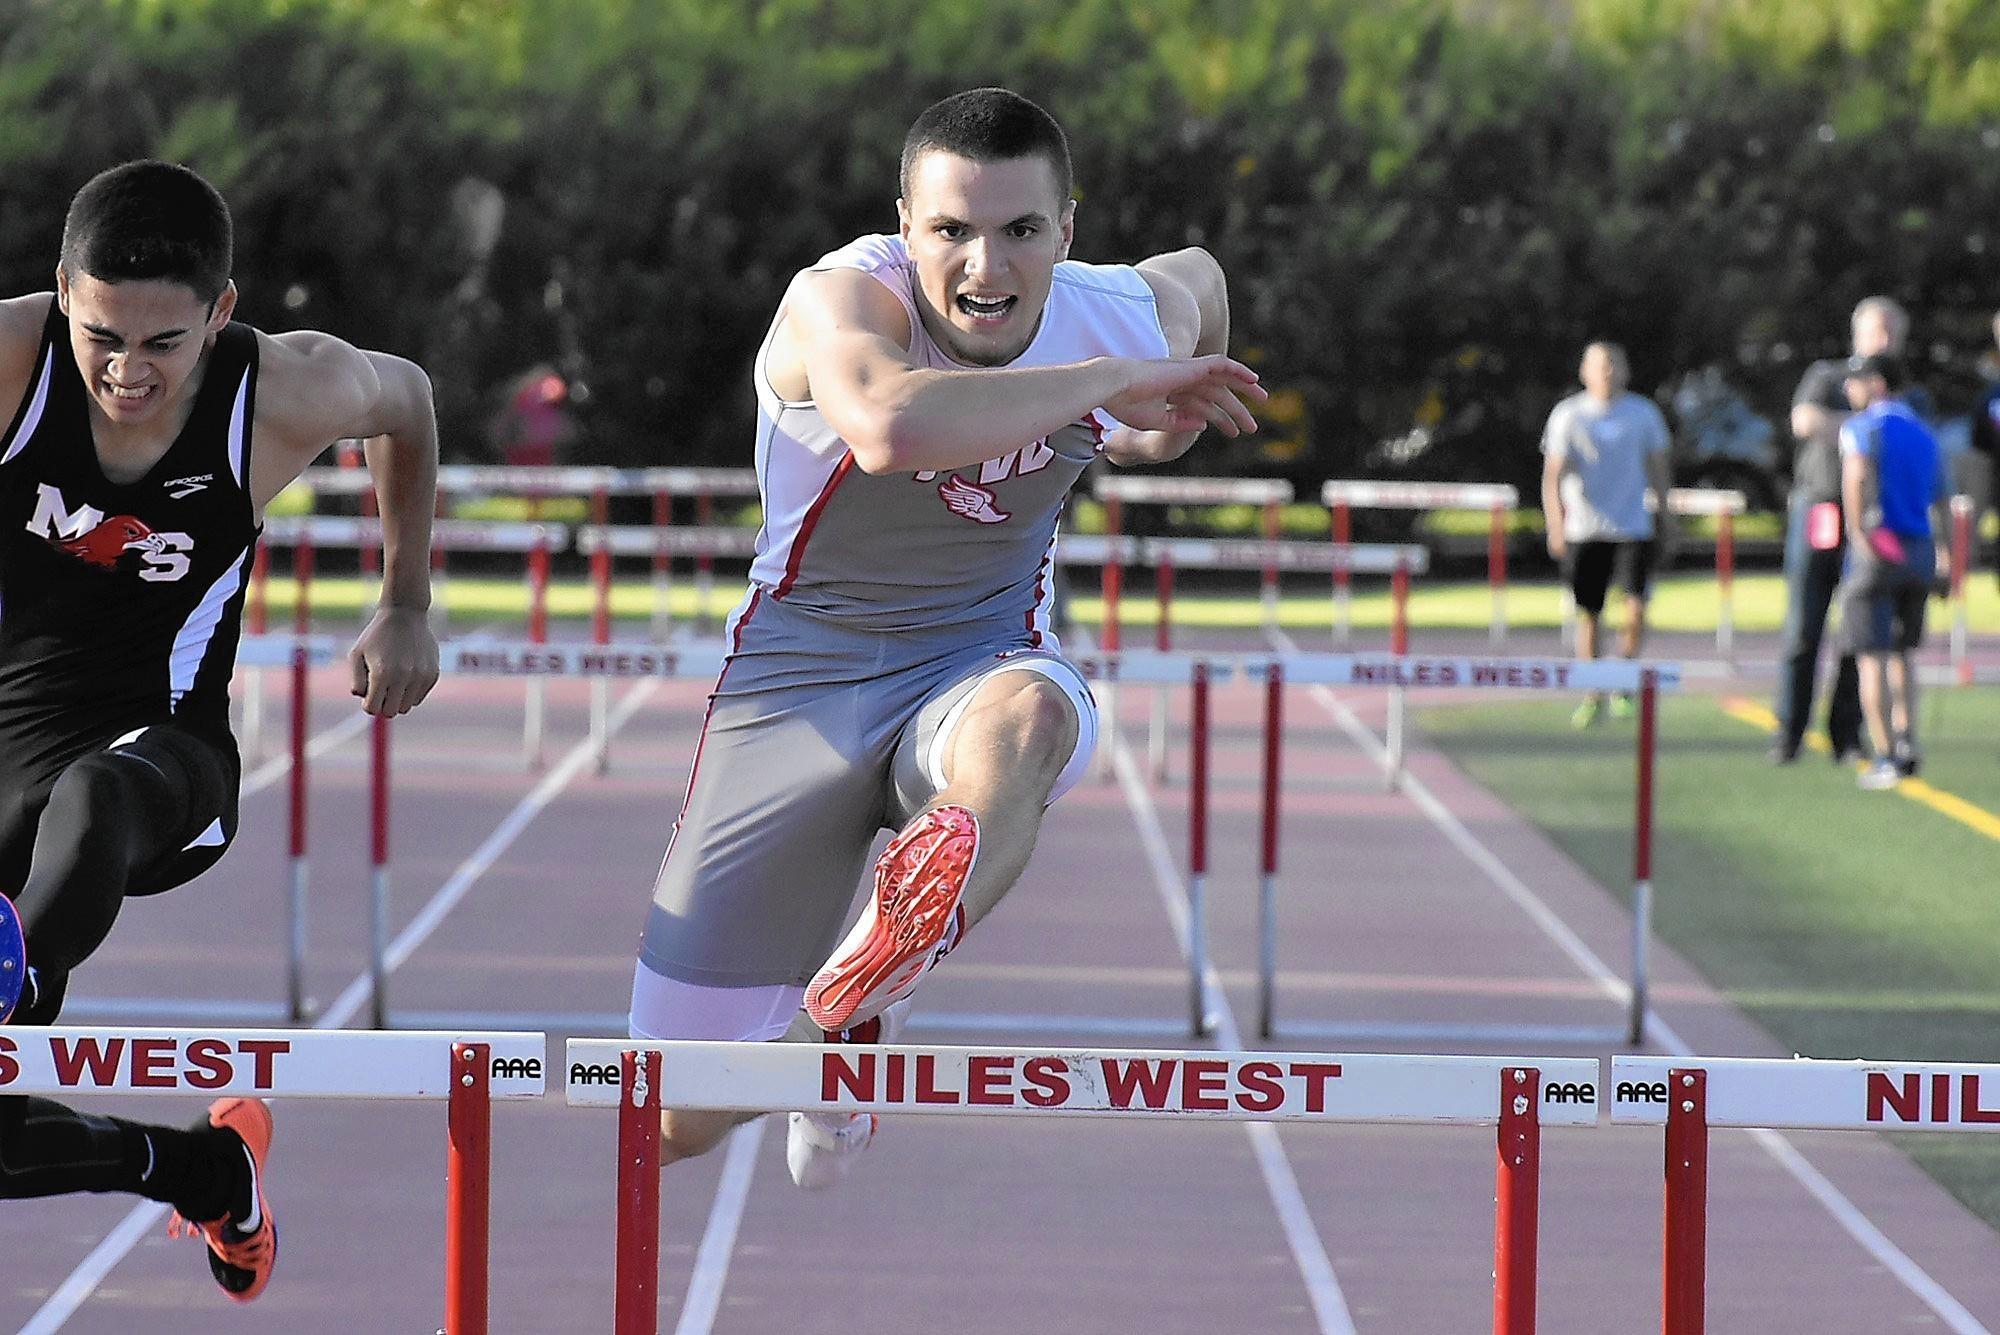 niles west track meet